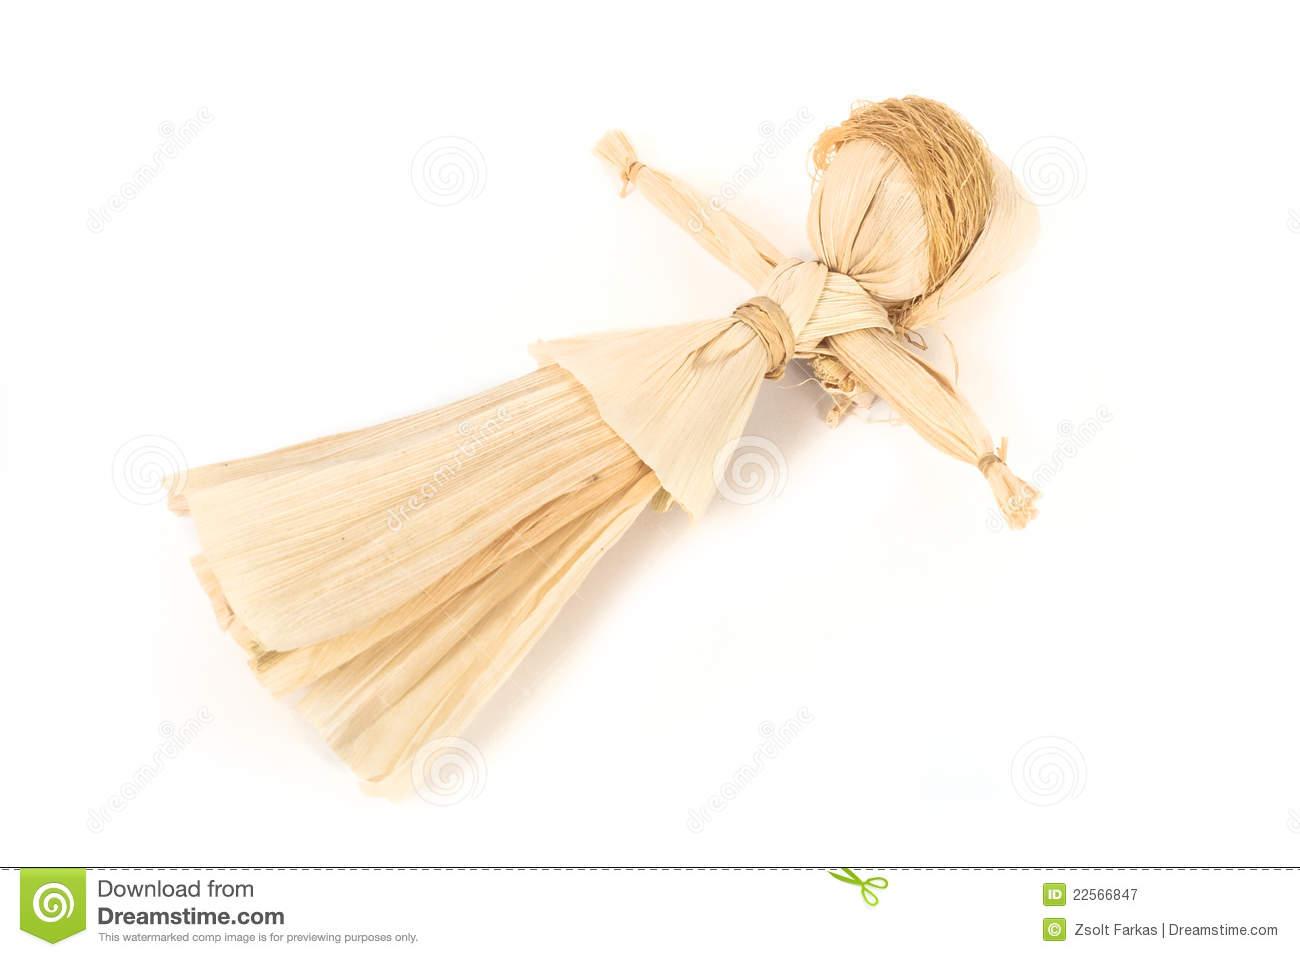 Corn Husk Doll Stock Photo.